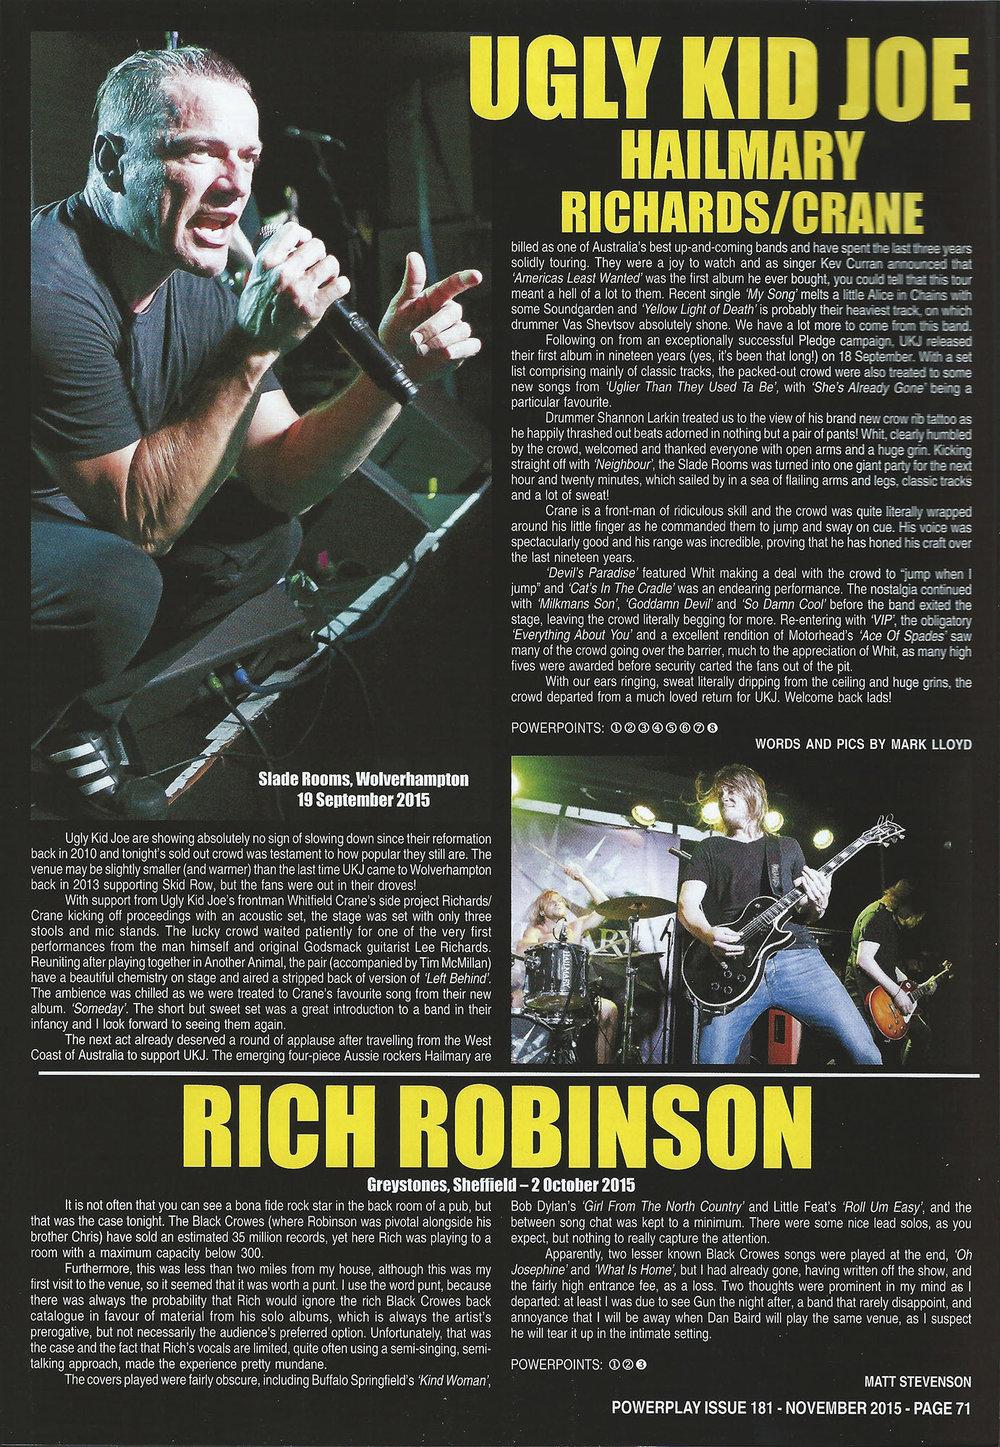 PowerPlay Magazine - Ugly Kid Joe Review and Photo